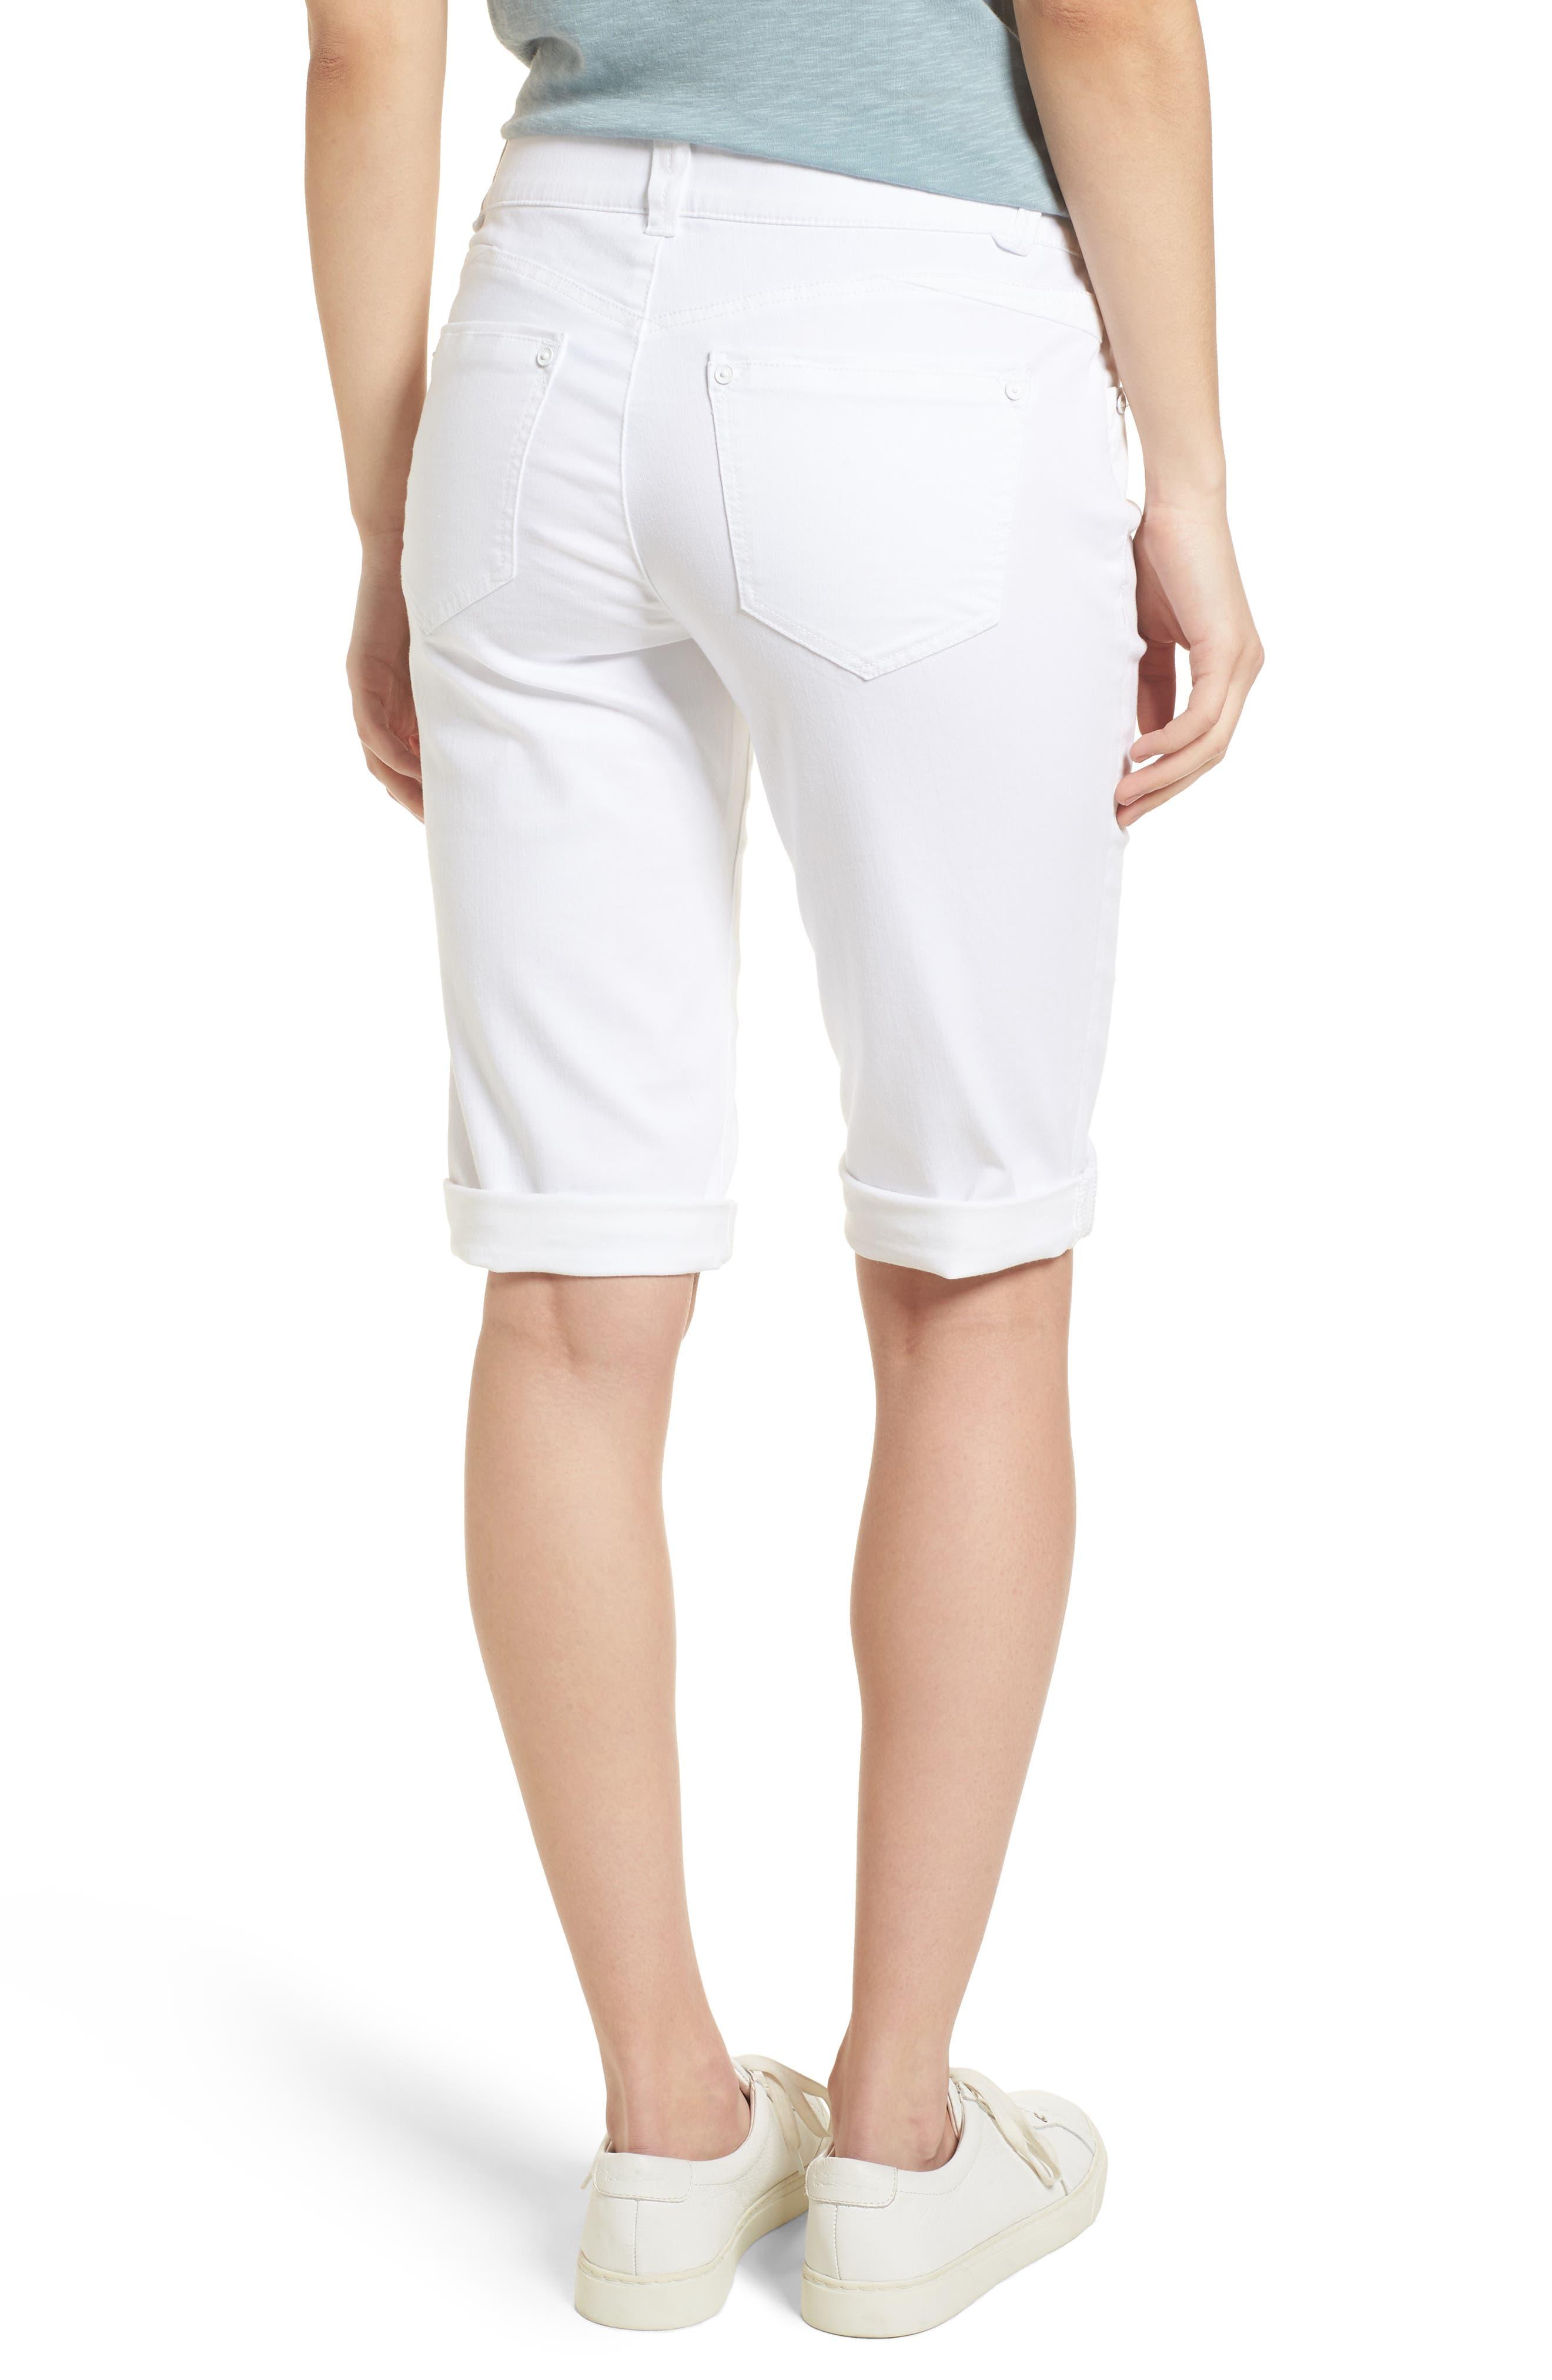 WIT & WISDOM, Ab-solution White Bermuda Shorts, Alternate thumbnail 2, color, OPTIC WHITE